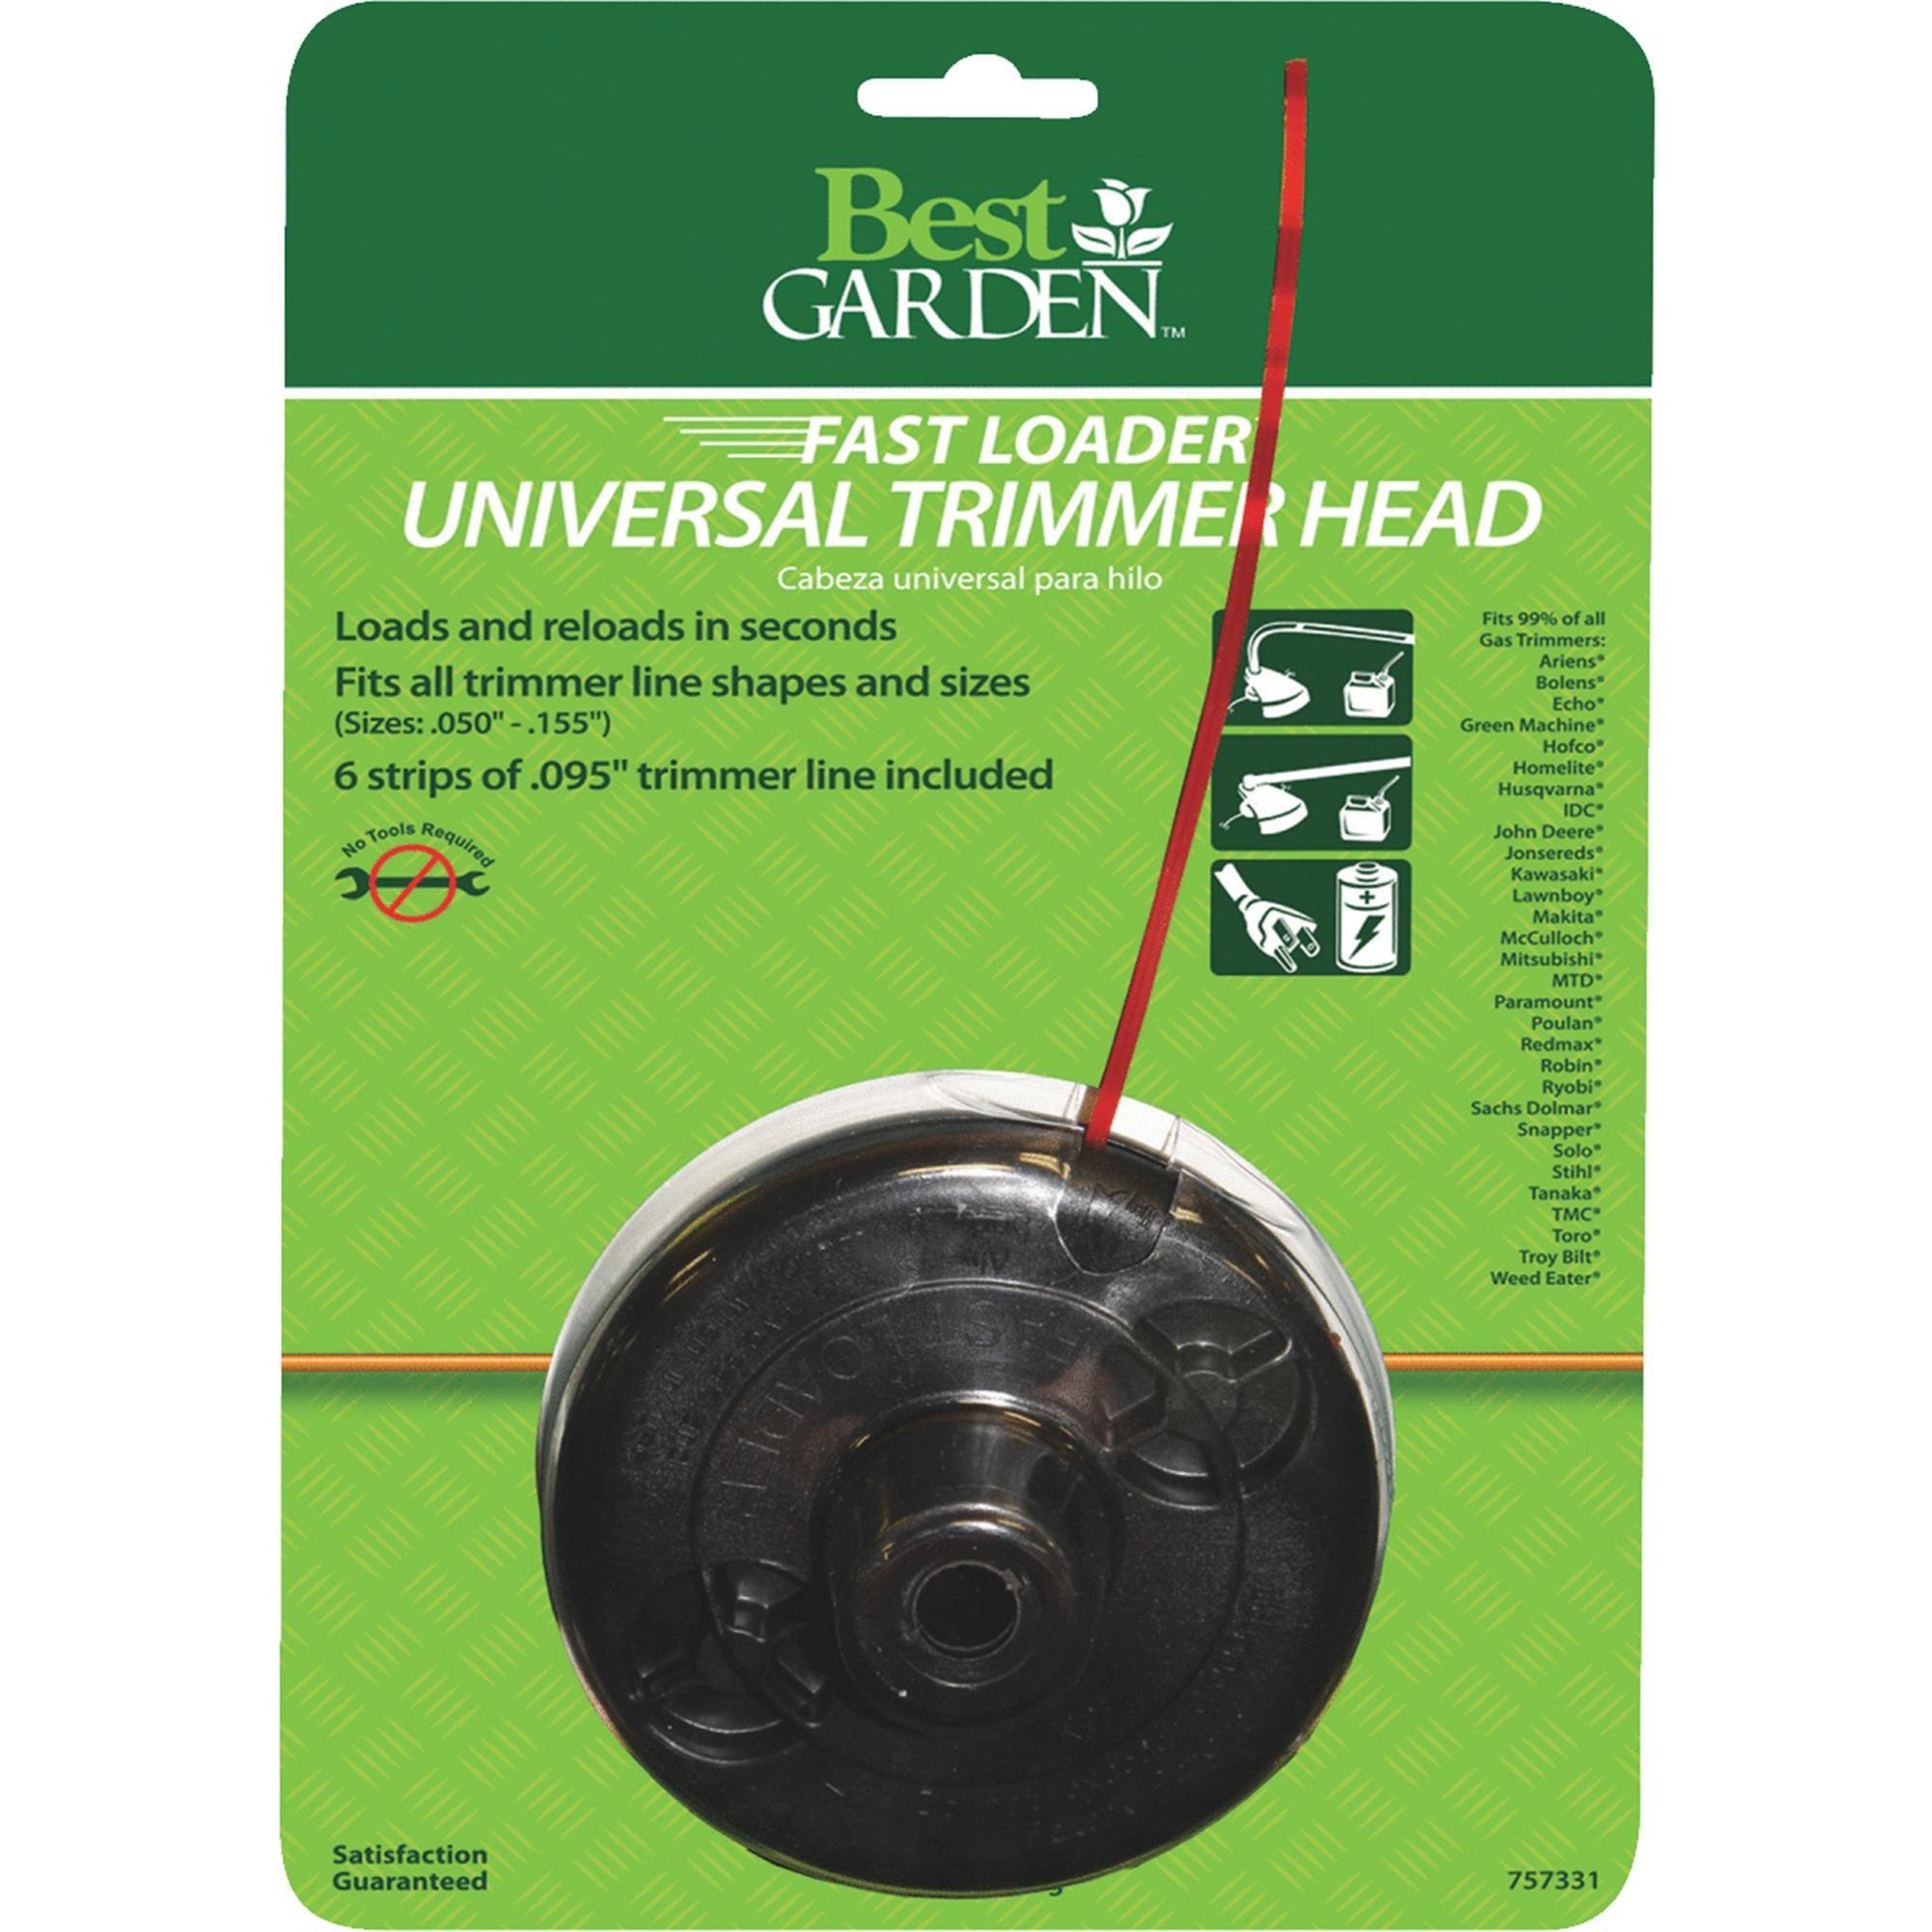 Best Garden Fast Loader Fixed Feed Universal Shaft